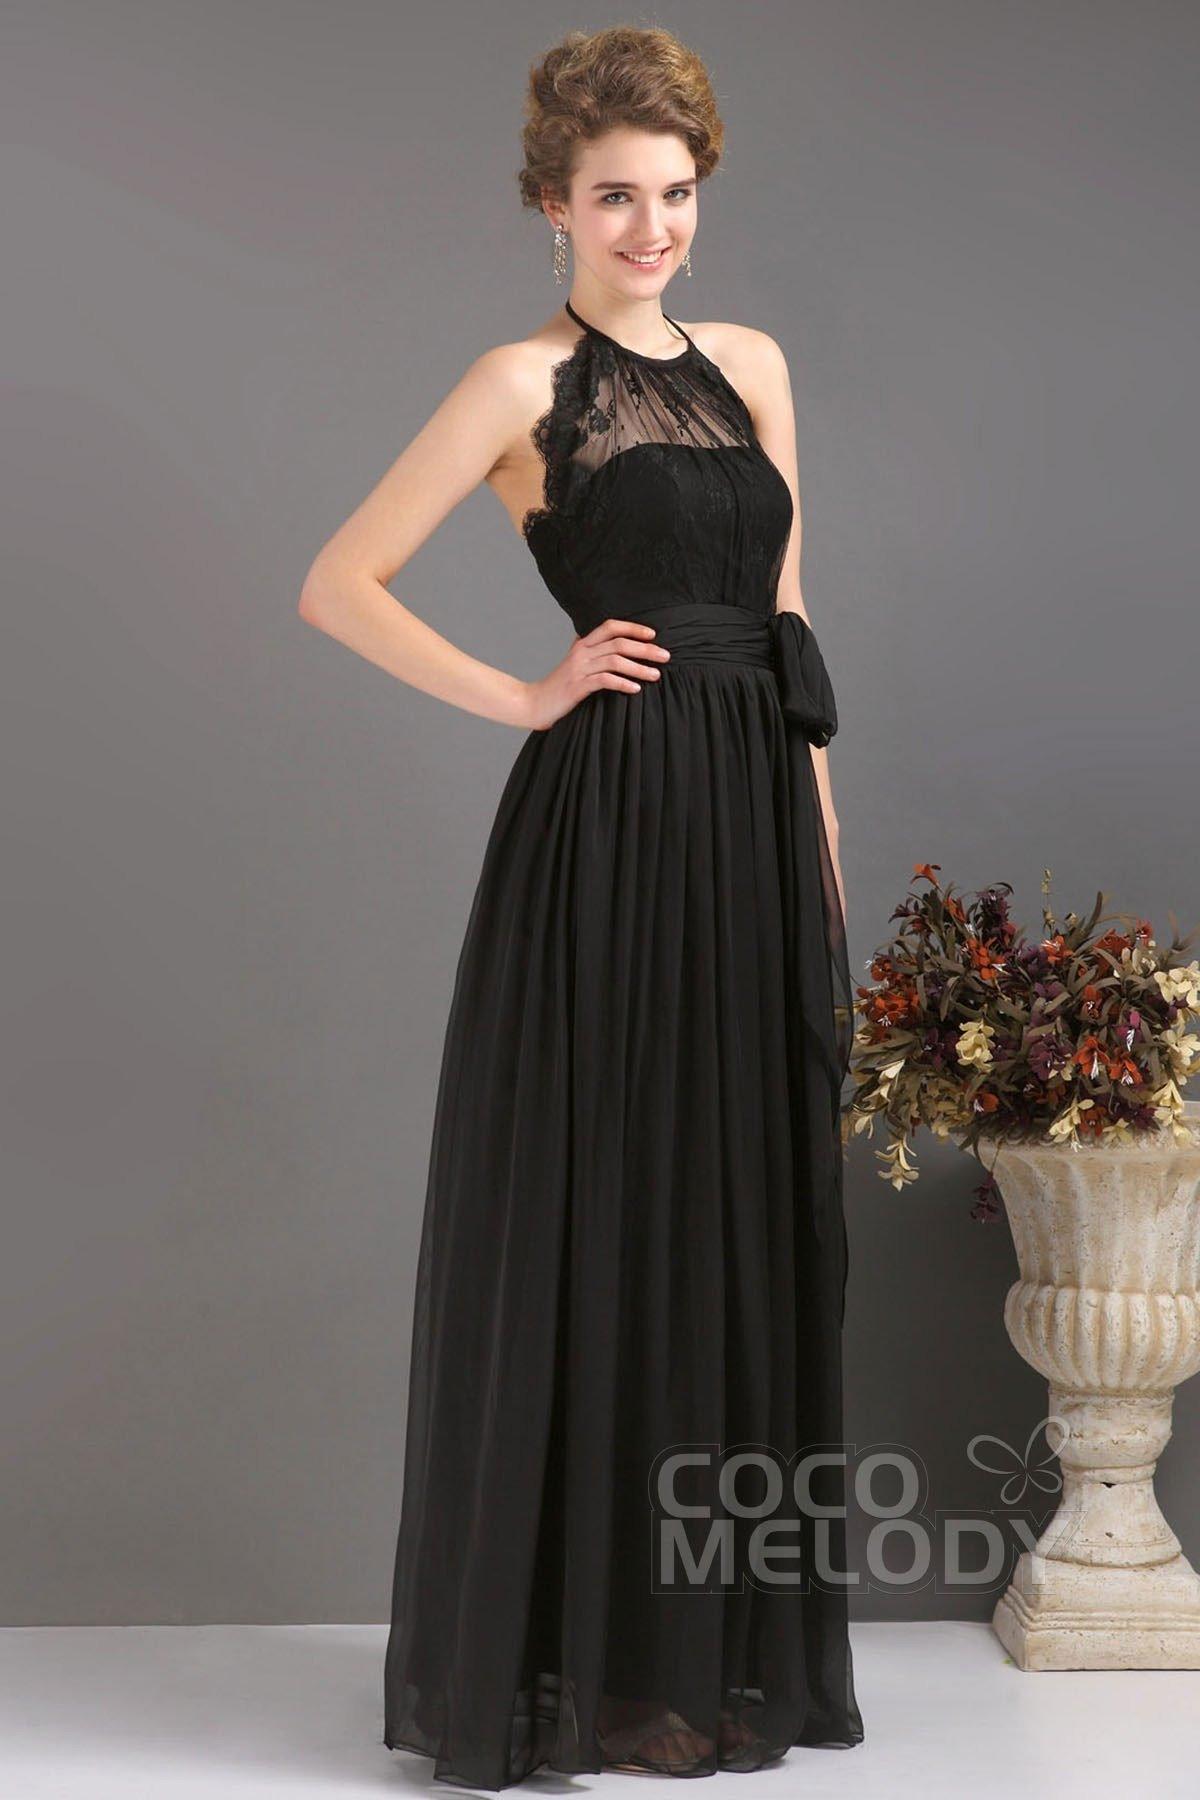 15 Perfekt Abendkleid Bodenlang Schwarz SpezialgebietFormal Spektakulär Abendkleid Bodenlang Schwarz Ärmel